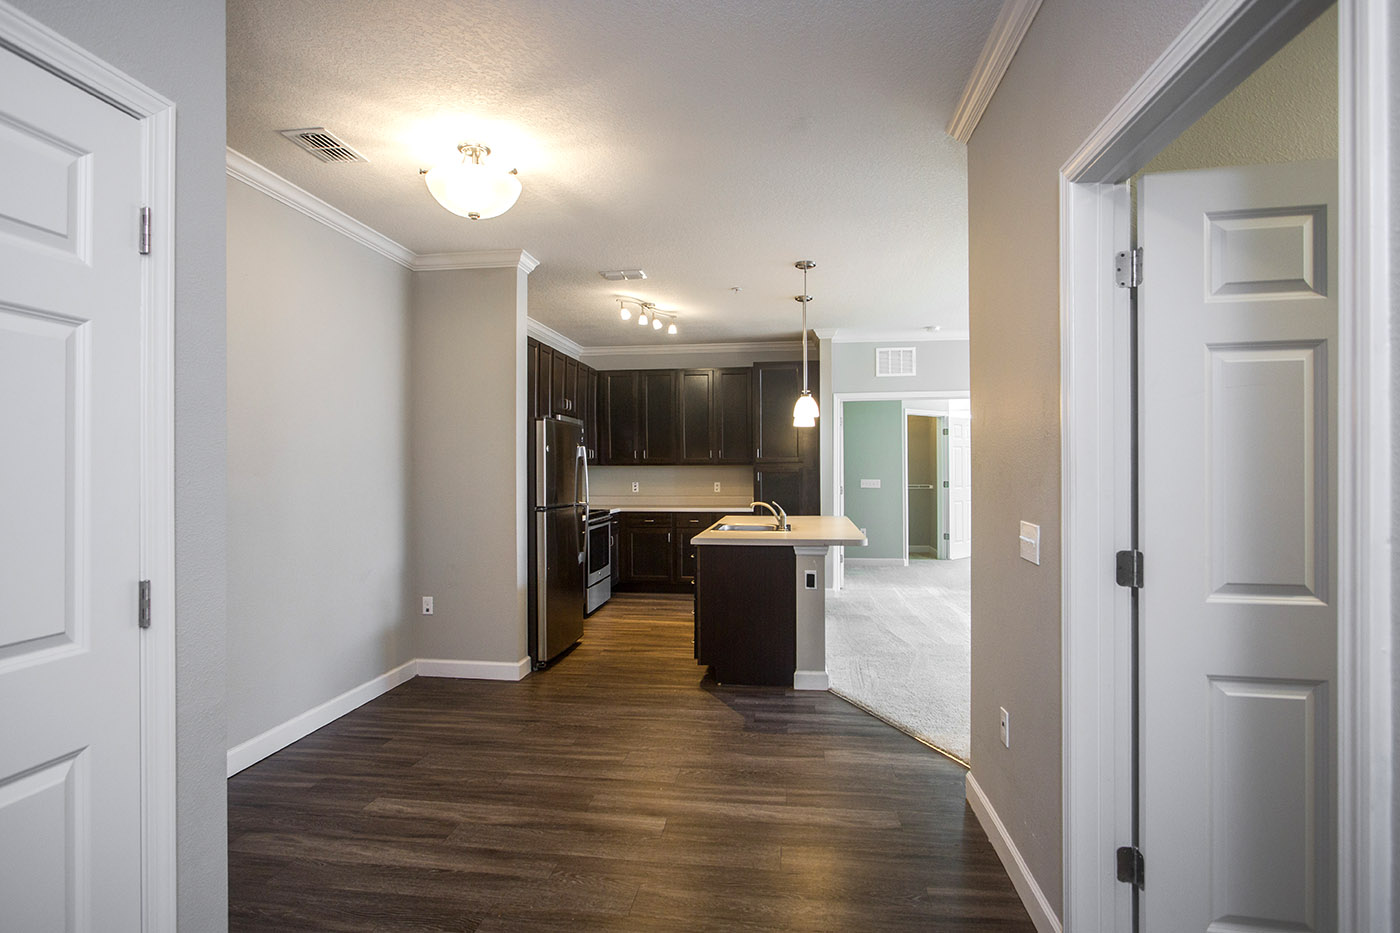 CharlestonEdge-Rental-Apartment-Brandon-Tampa-Florida-Pool-Bedrooms-Interior-7.jpg